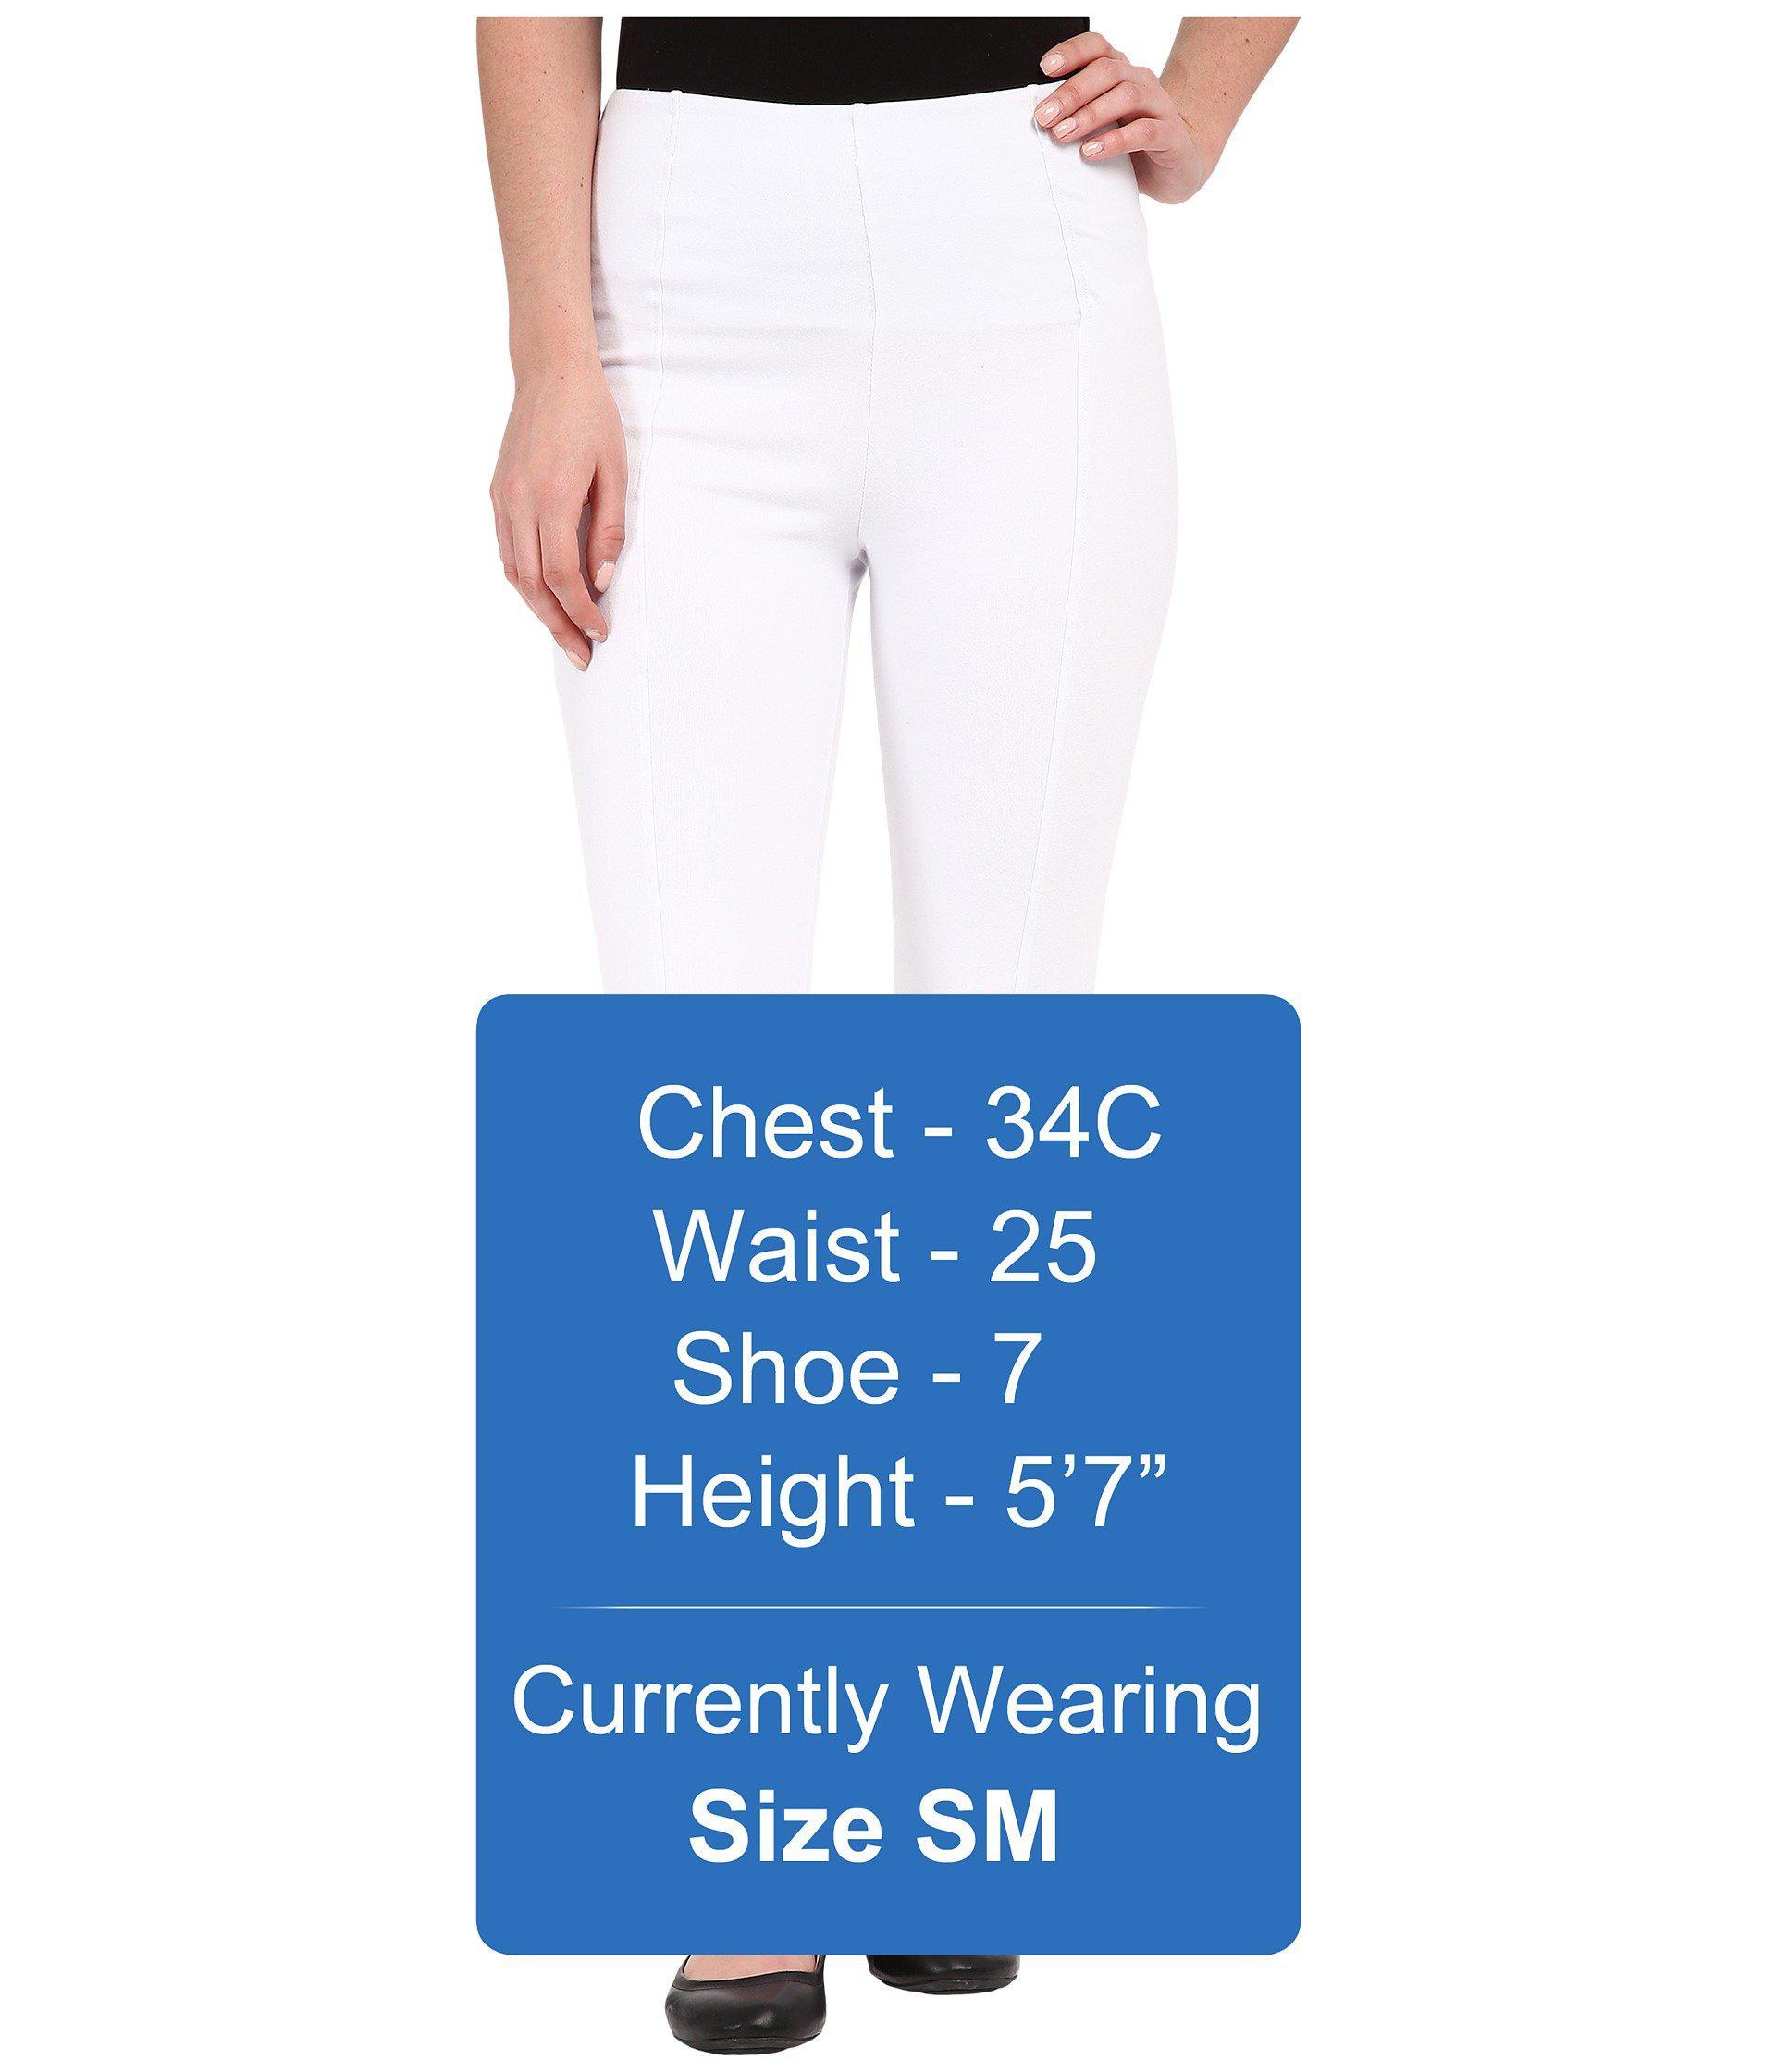 c160a6bd2c2dfd Lyst - Lyssé Clara Cotton Leggings in White